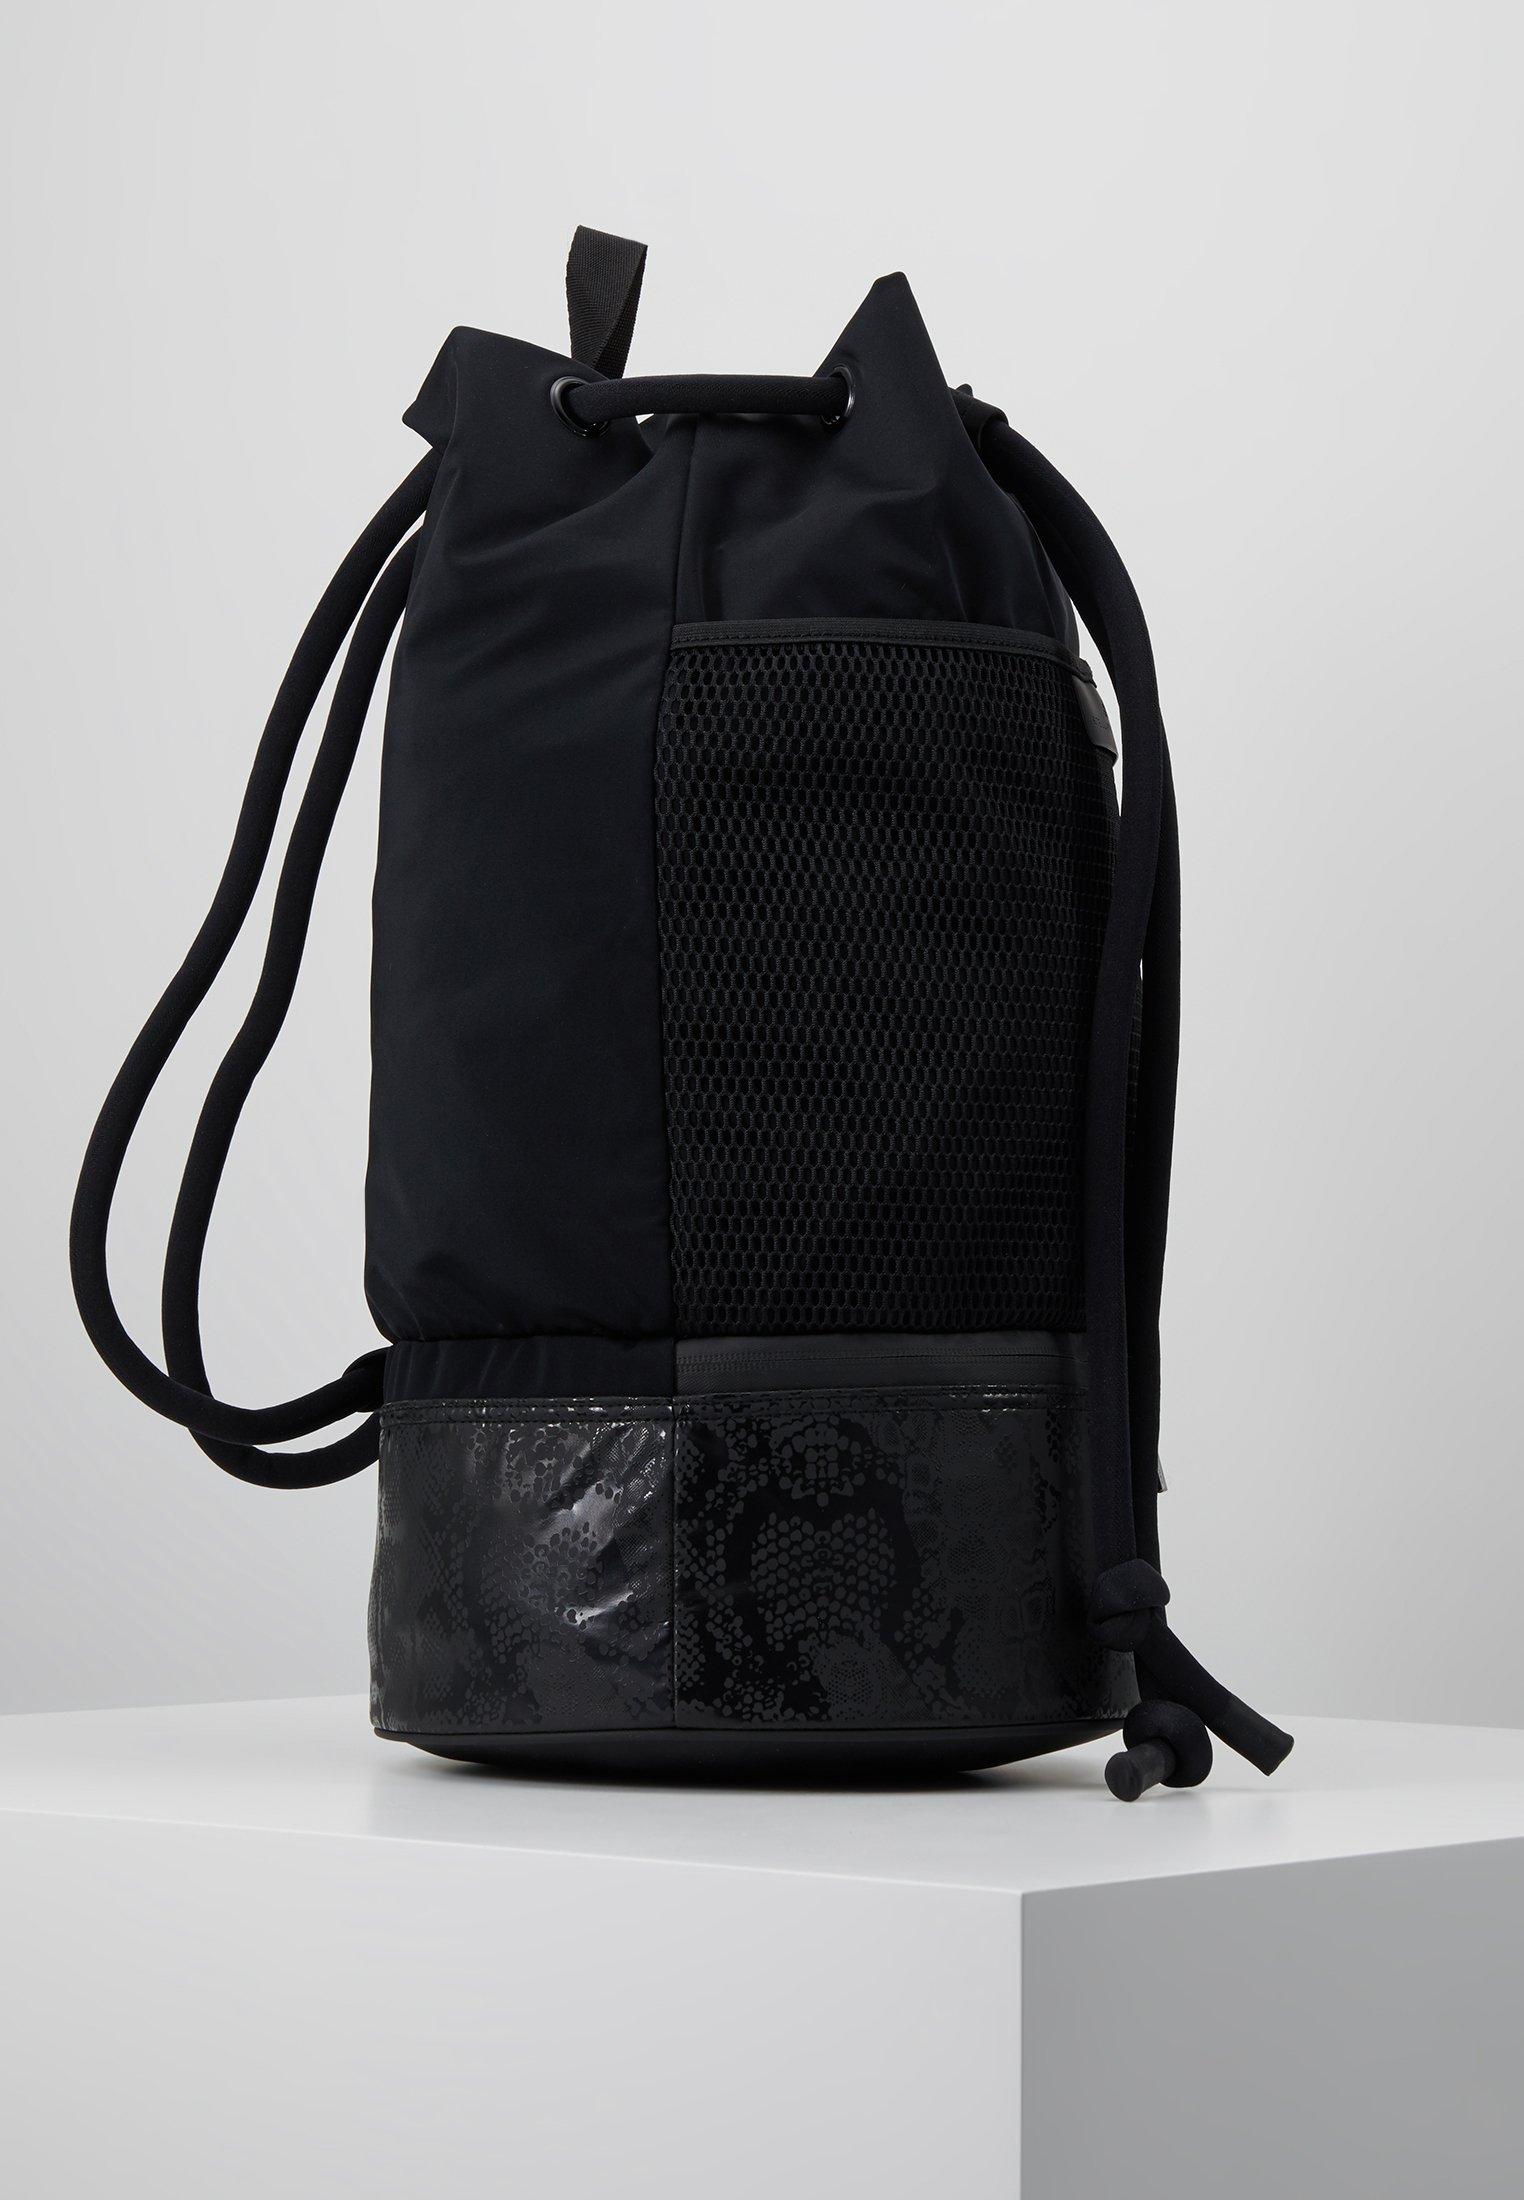 Adidas By Stella Mccartney Boxing Gymsack - Sports Bag Black/black/white